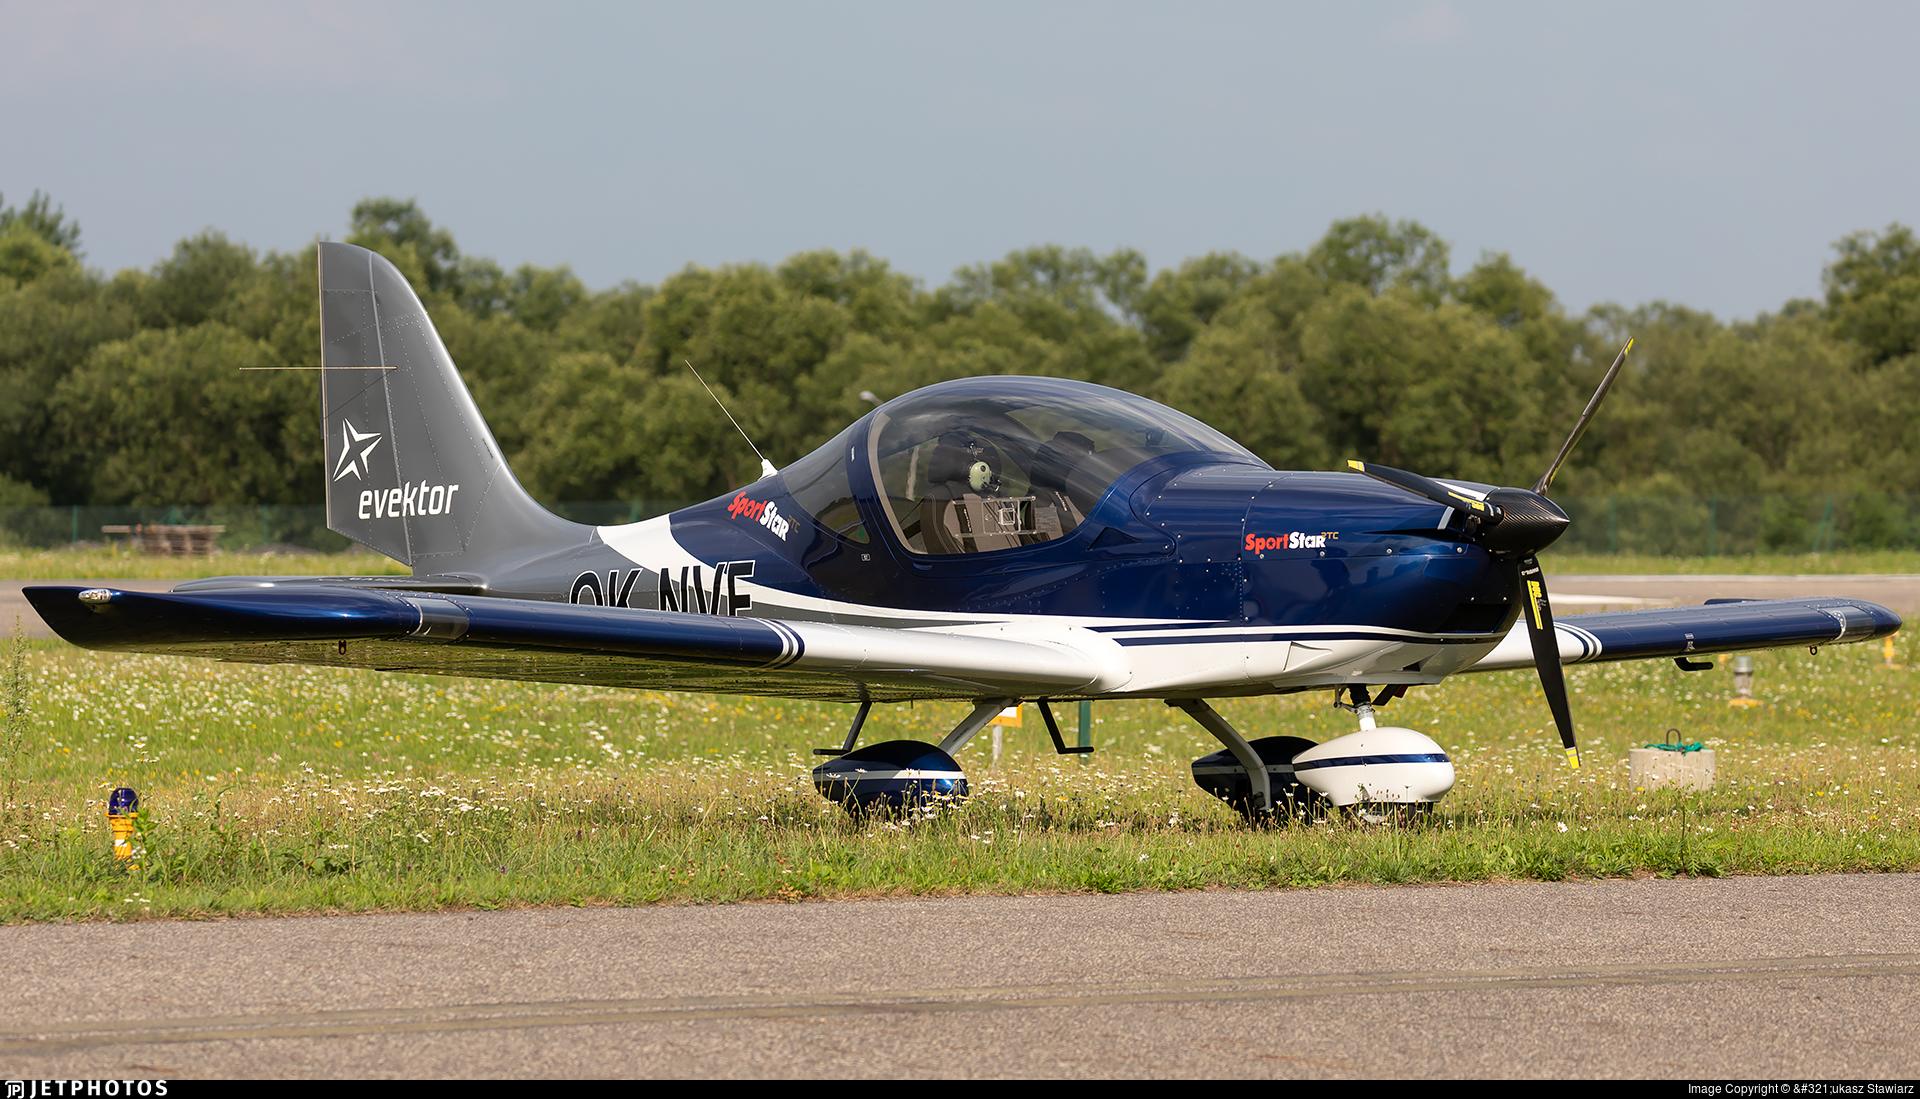 OK-NVF - Evektor SportStar RTC - Evektor-Aerotechnik